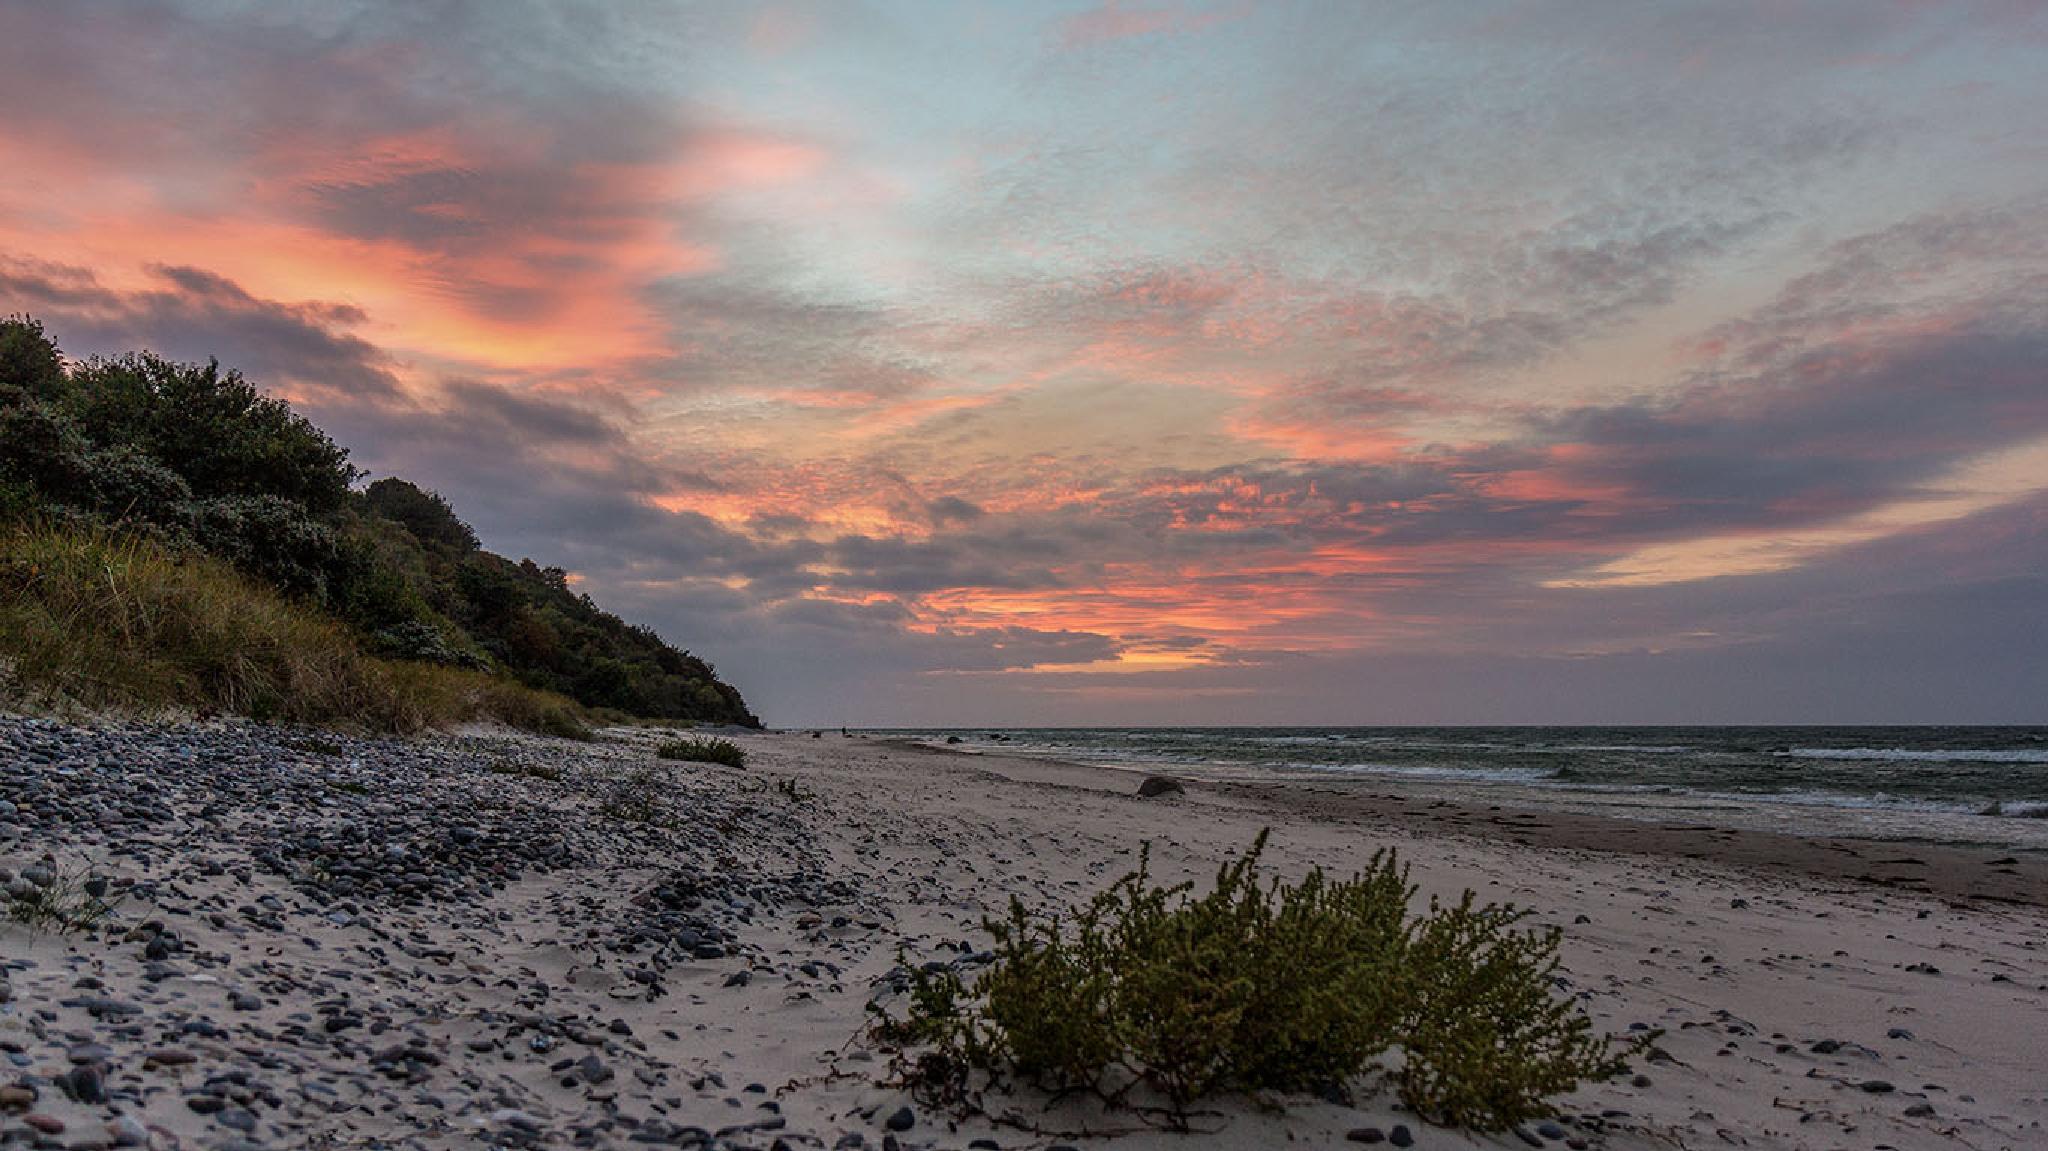 Rügen Island Sunset | Germany by MEHO Photography